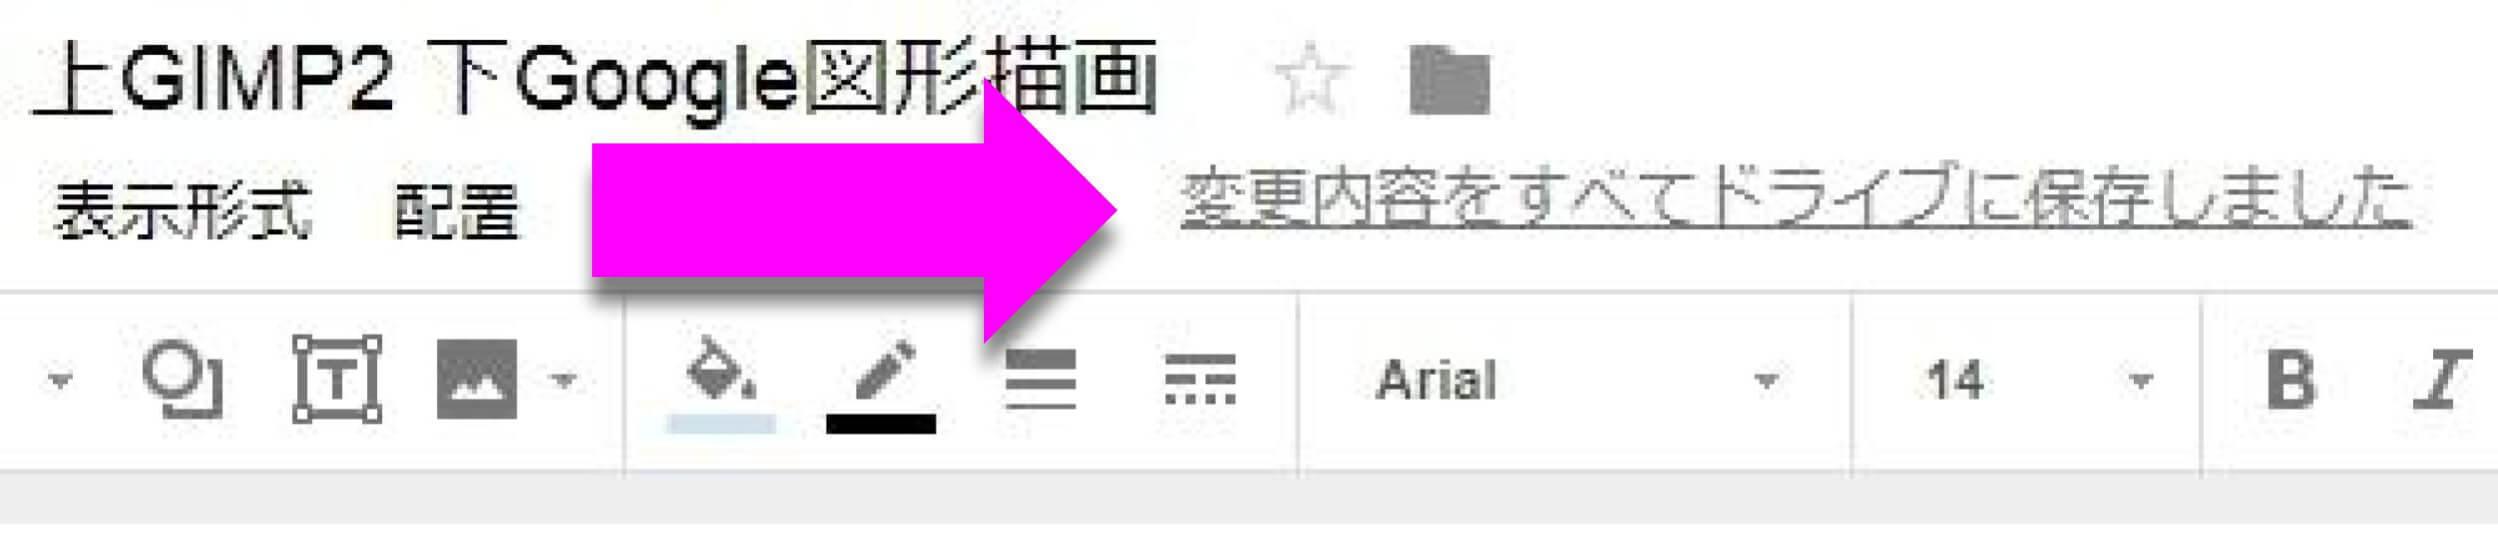 Google図形描画 変更内容保存